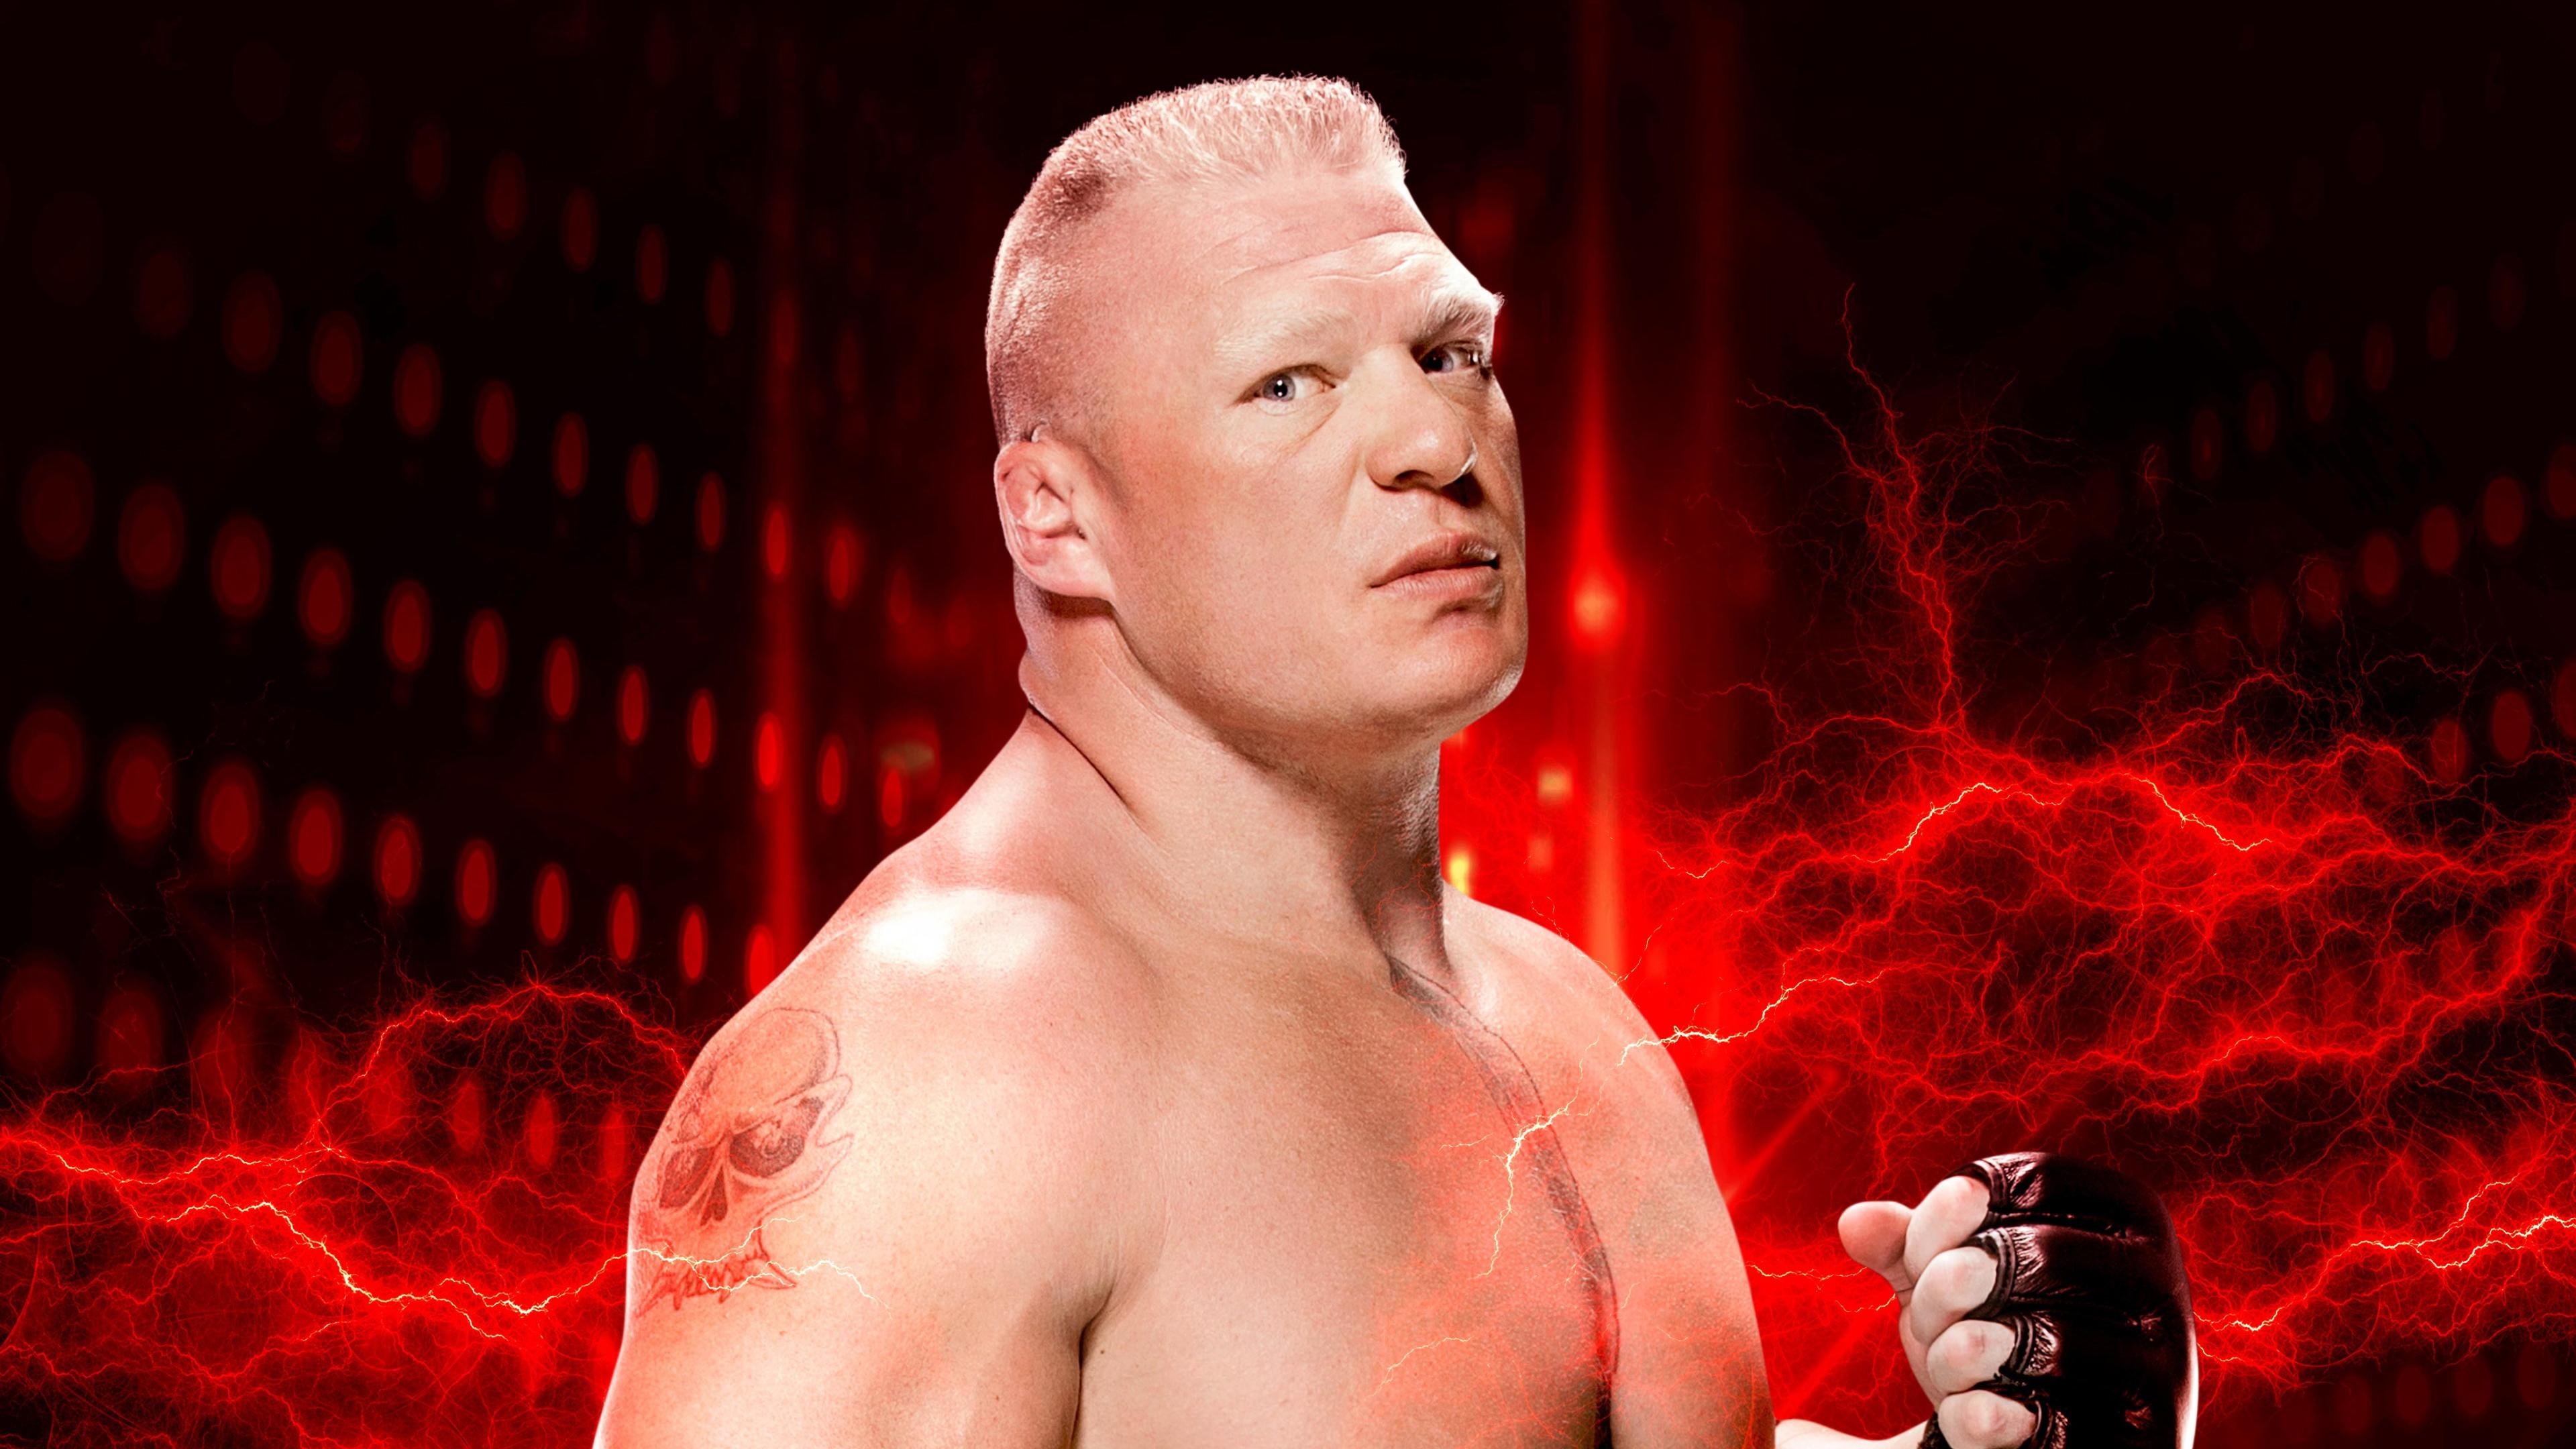 brock lesnar wwe 2k19 1537691966 - Brock Lesnar WWE 2K19 - wwe wallpapers, wwe 2k19 wallpapers, hd-wallpapers, games wallpapers, brock lesnar wallpapers, 4k-wallpapers, 2019 games wallpapers